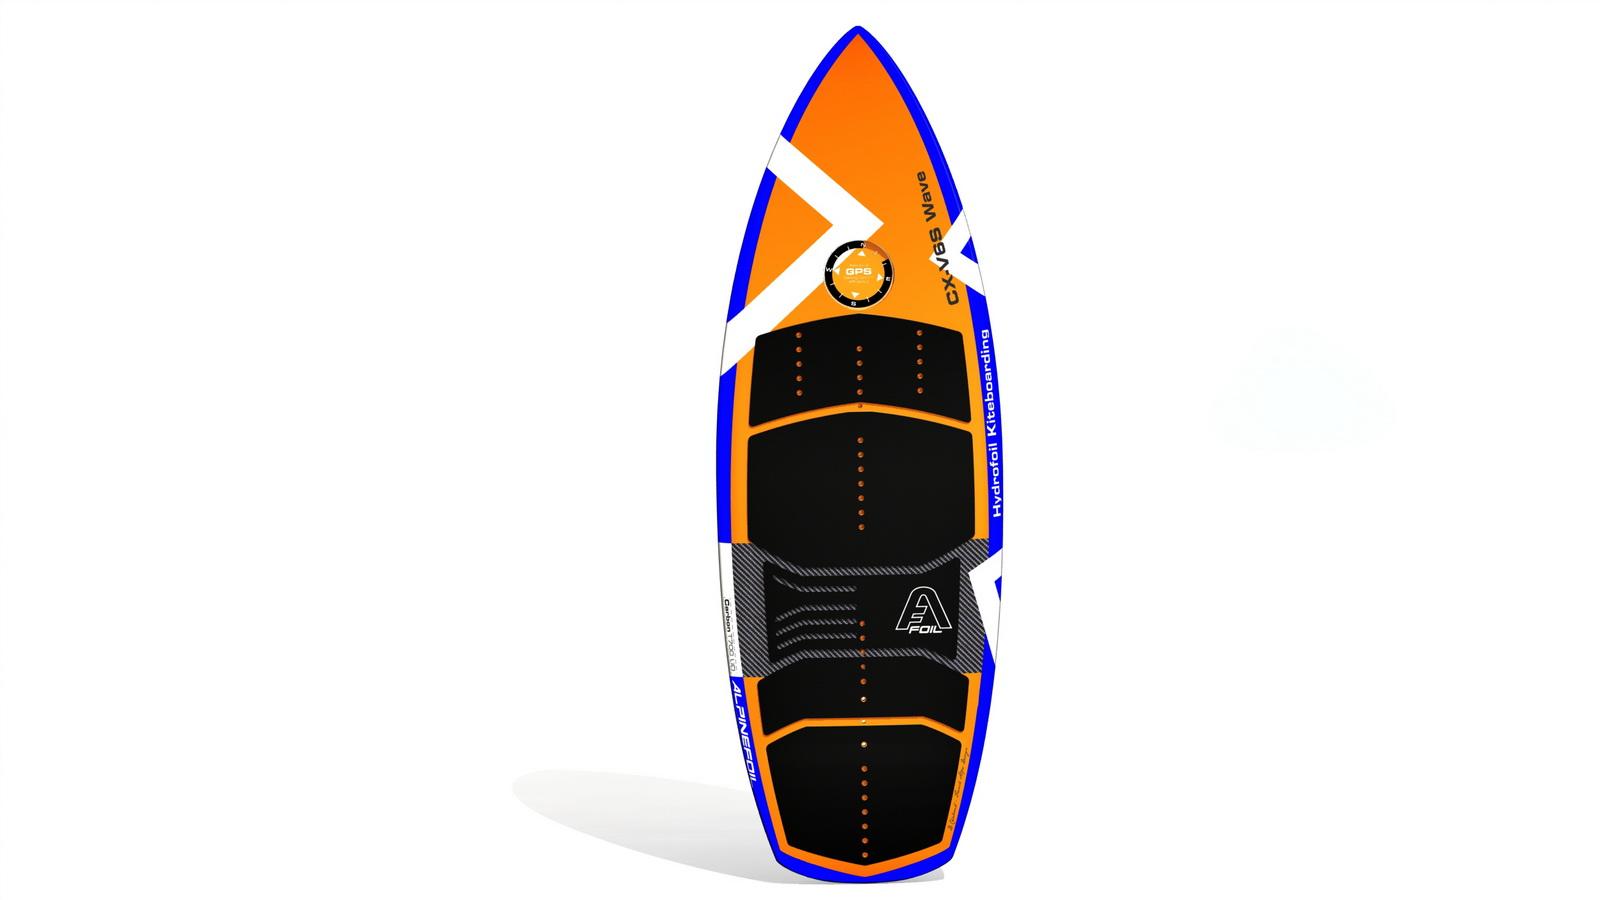 Kitefoil foilboard alpinefoil cx v6s wave 1